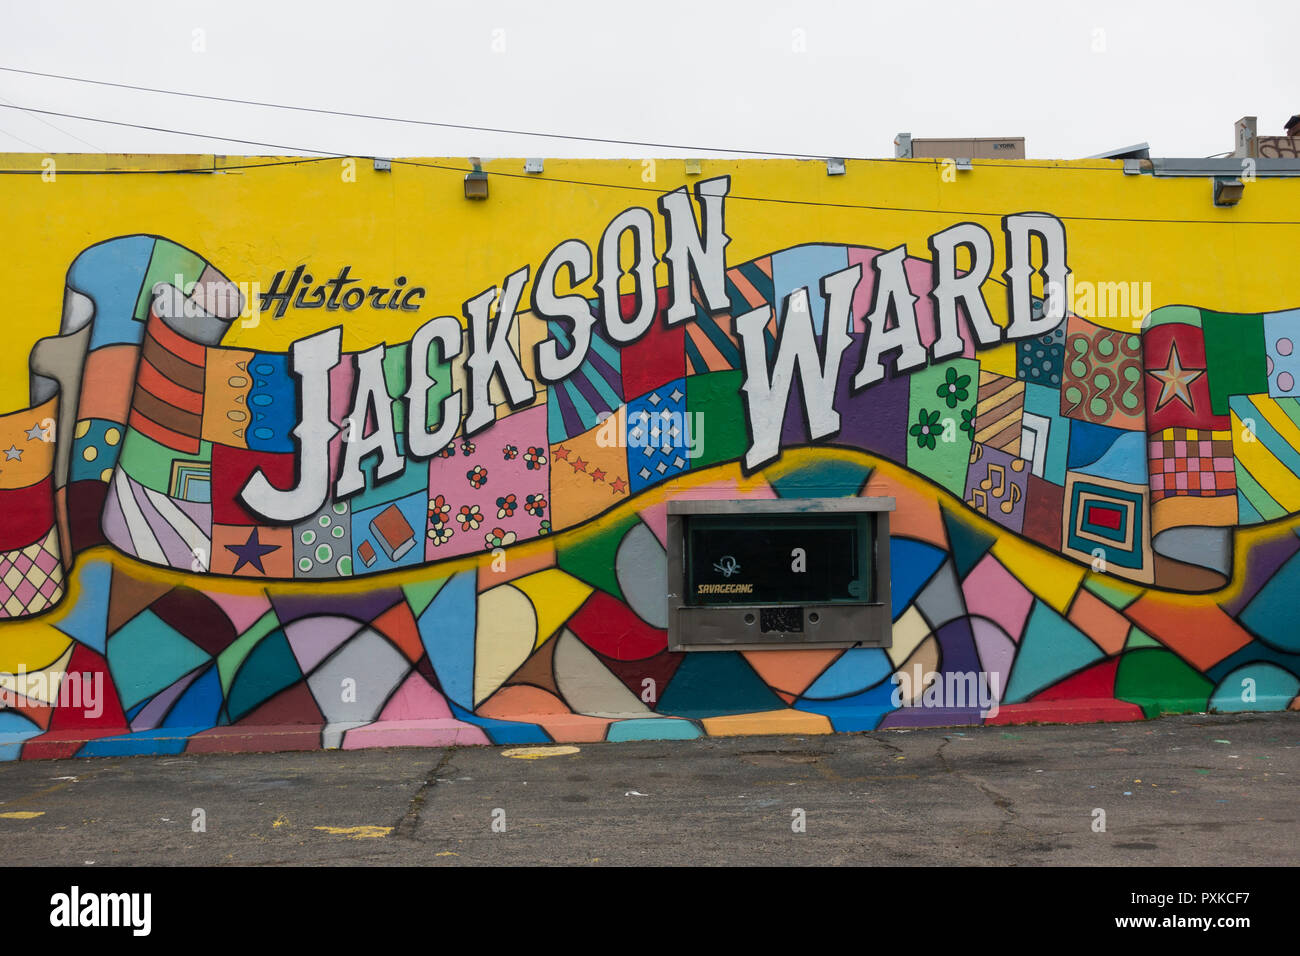 Jackson Ward murals Richmond Virginia - Stock Image